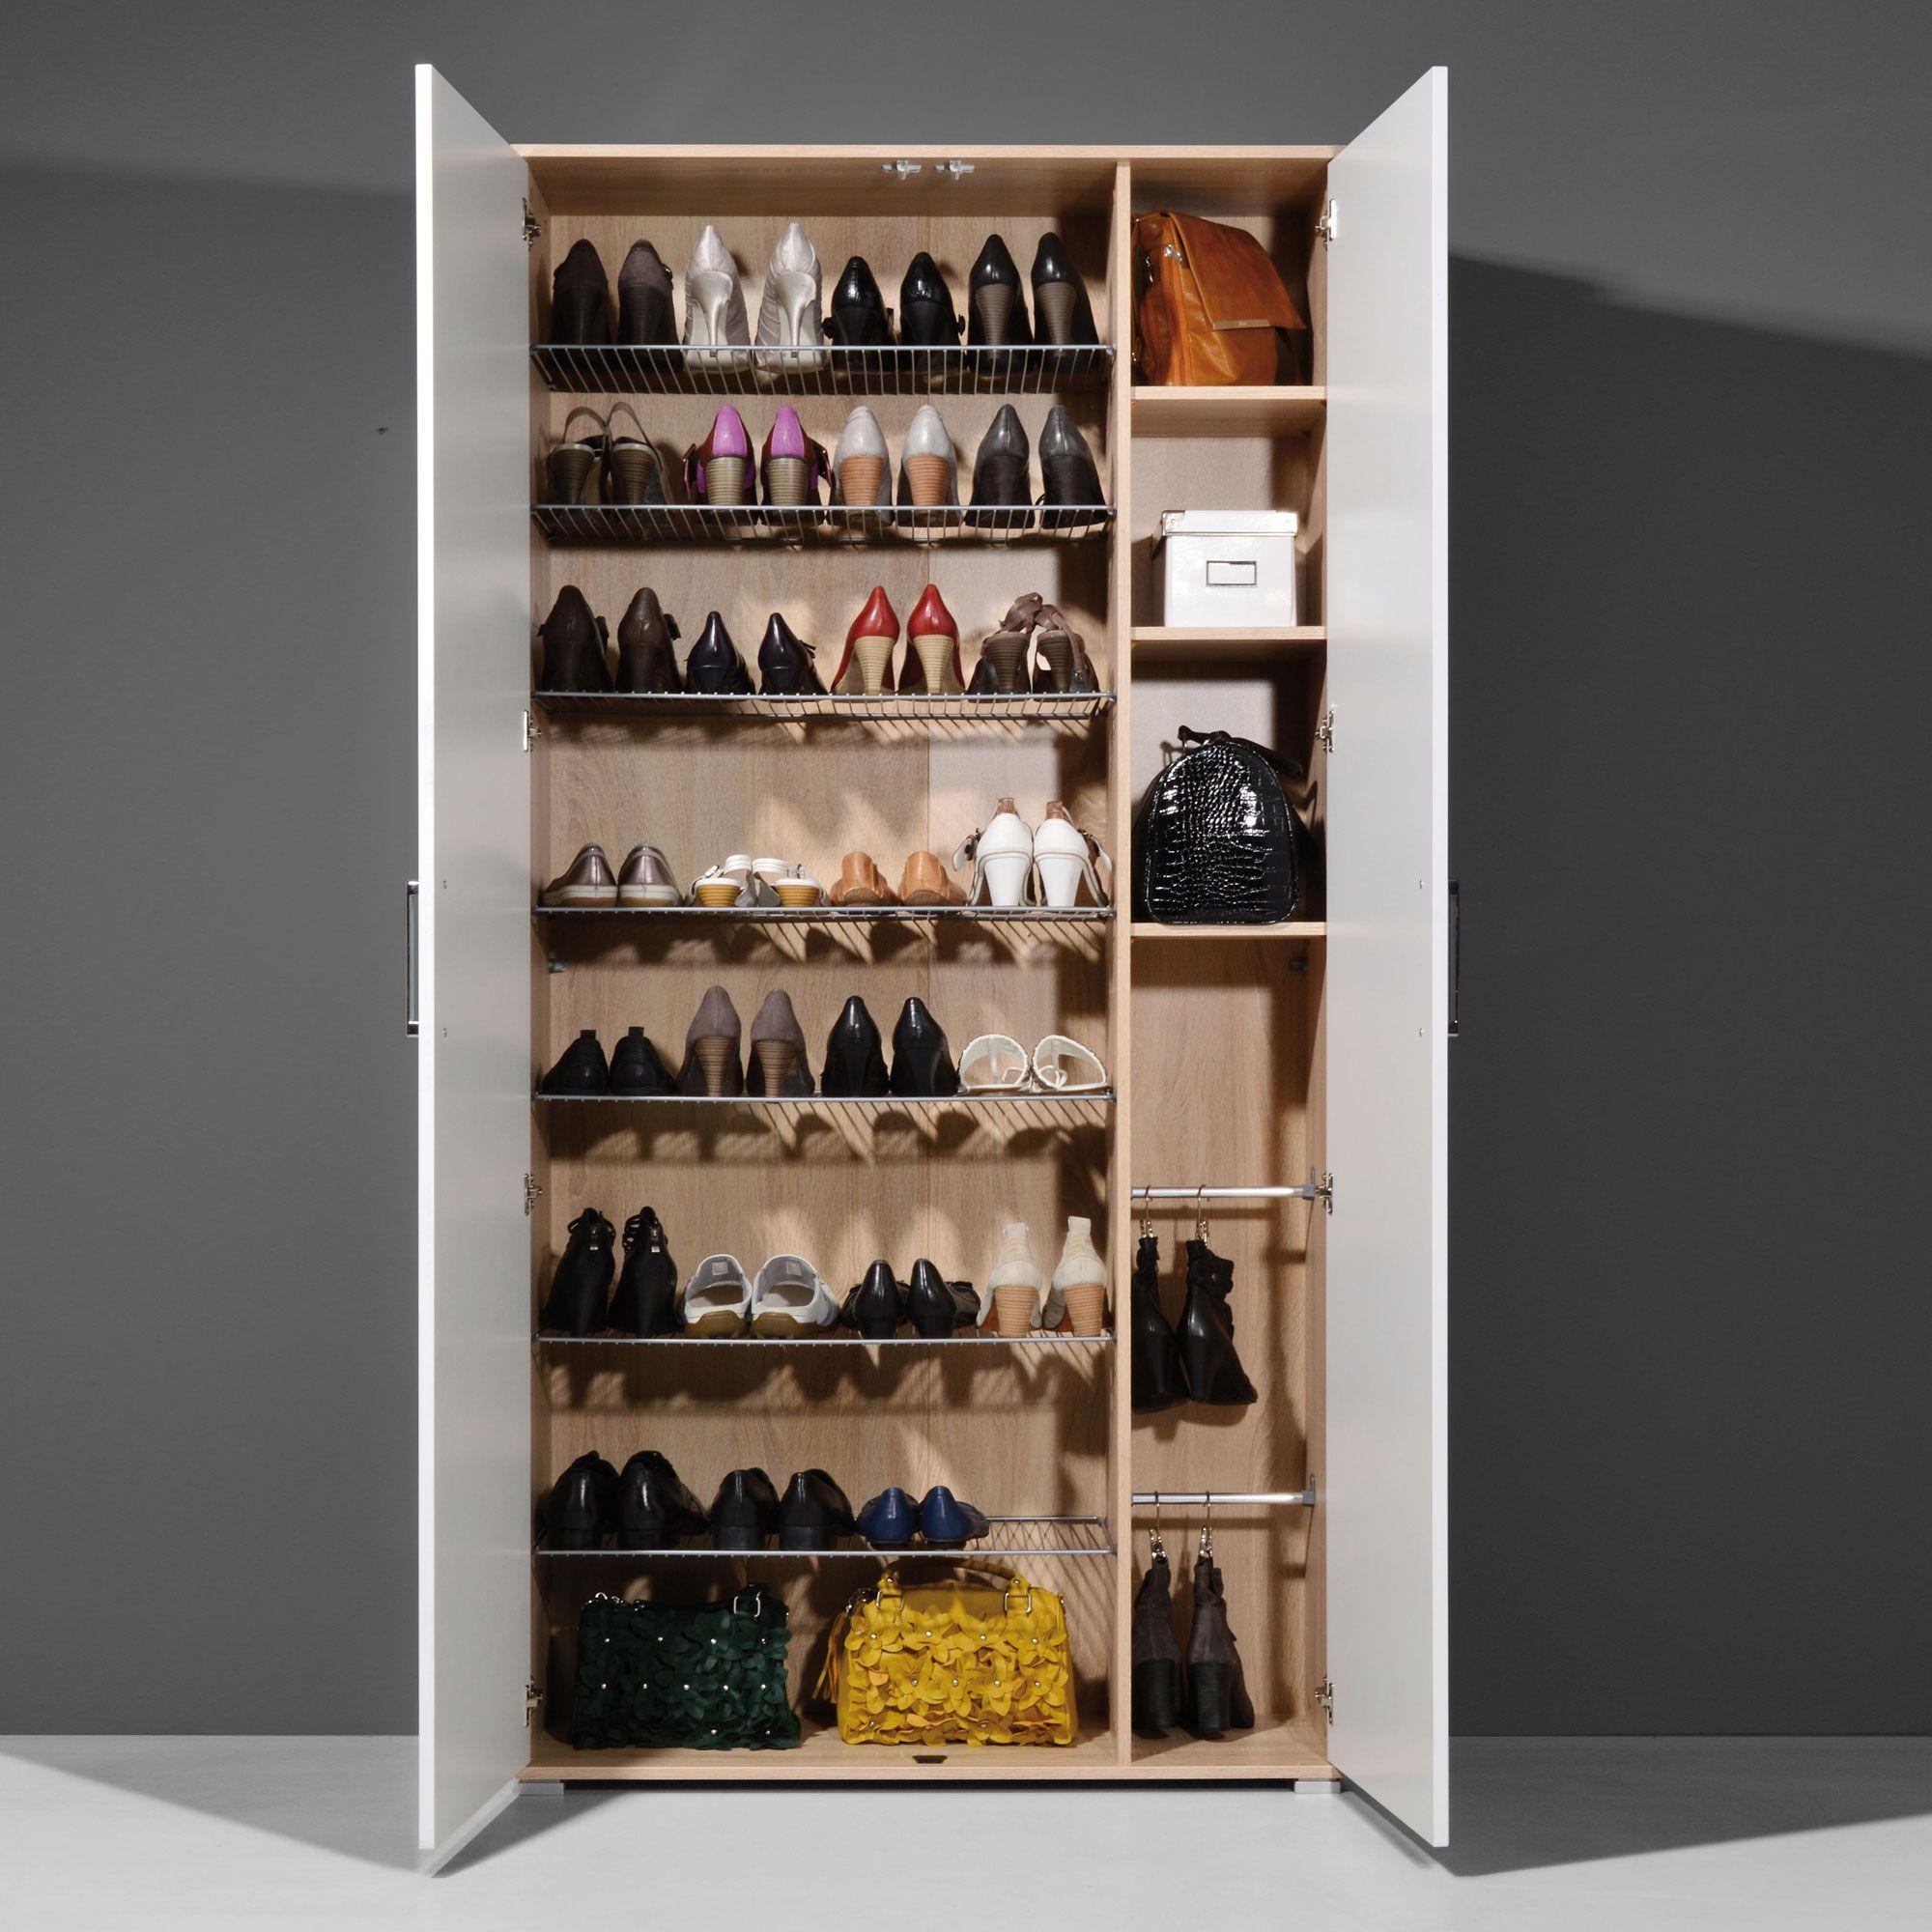 Inspirant Meuble Des Chaussures Diy Closet Closet Bedroom Shoe Closet